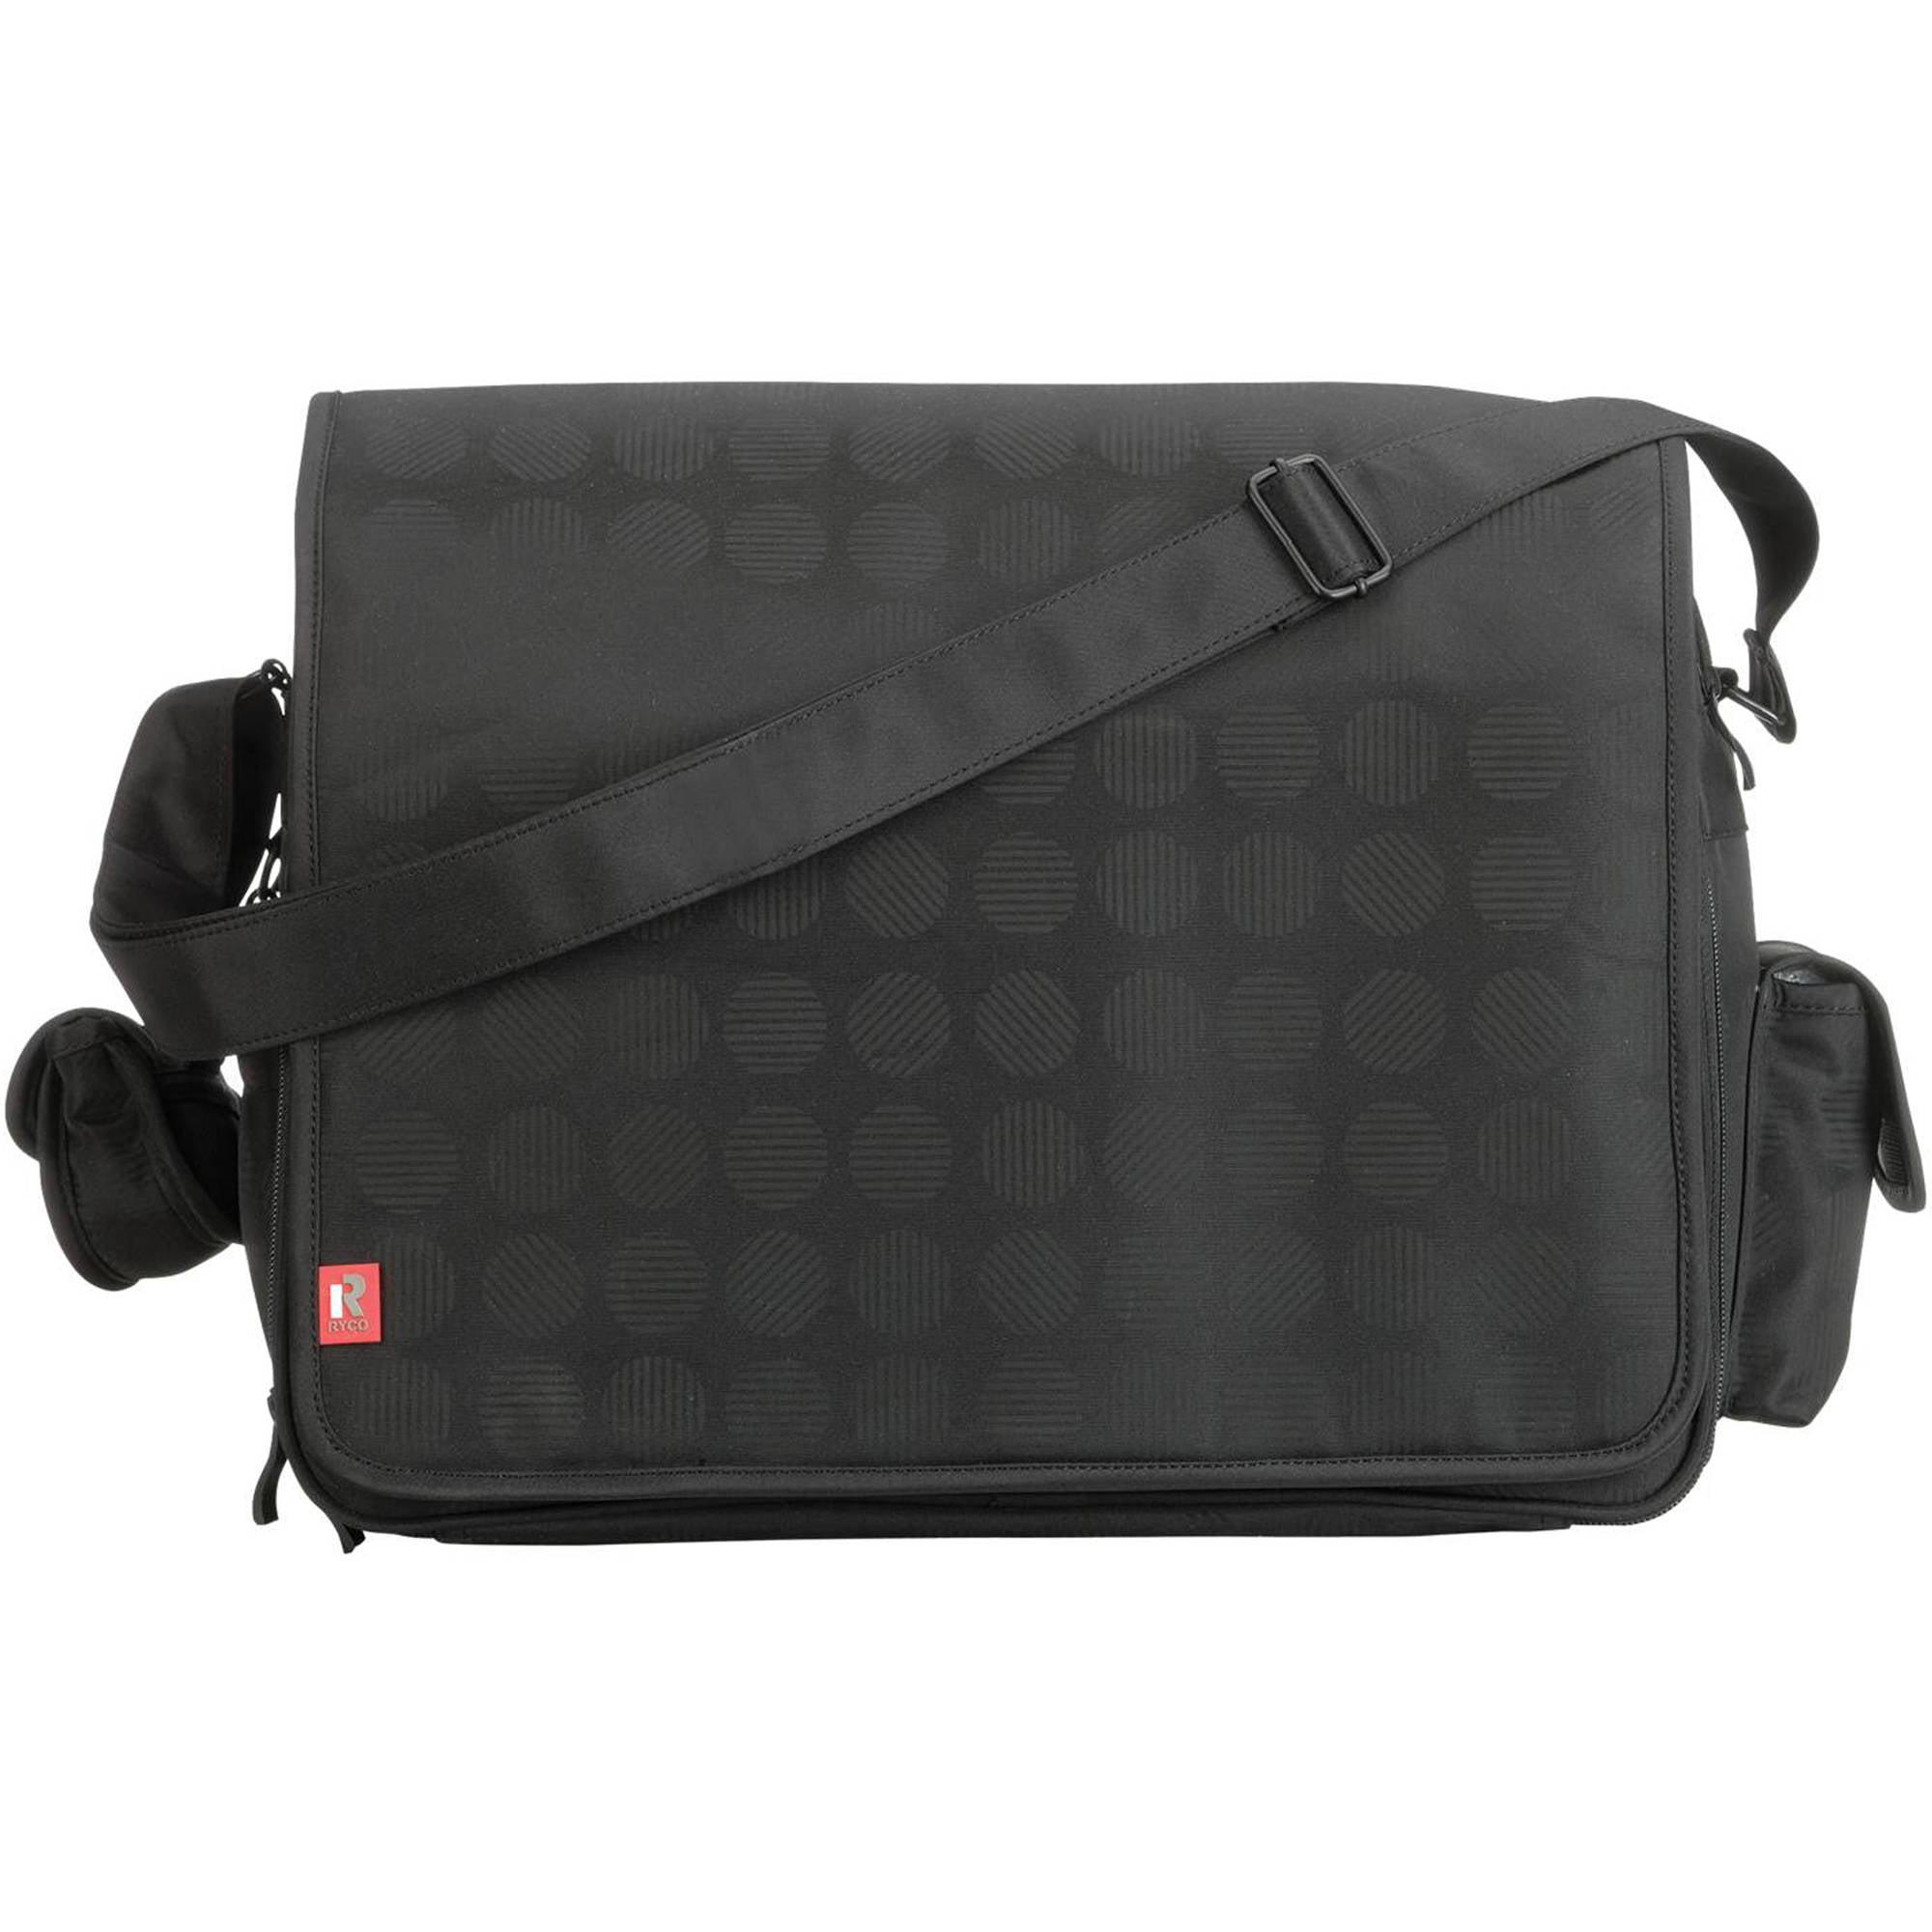 RYCO Stella Everyday Messenger Duffle Diaper Bag, Black